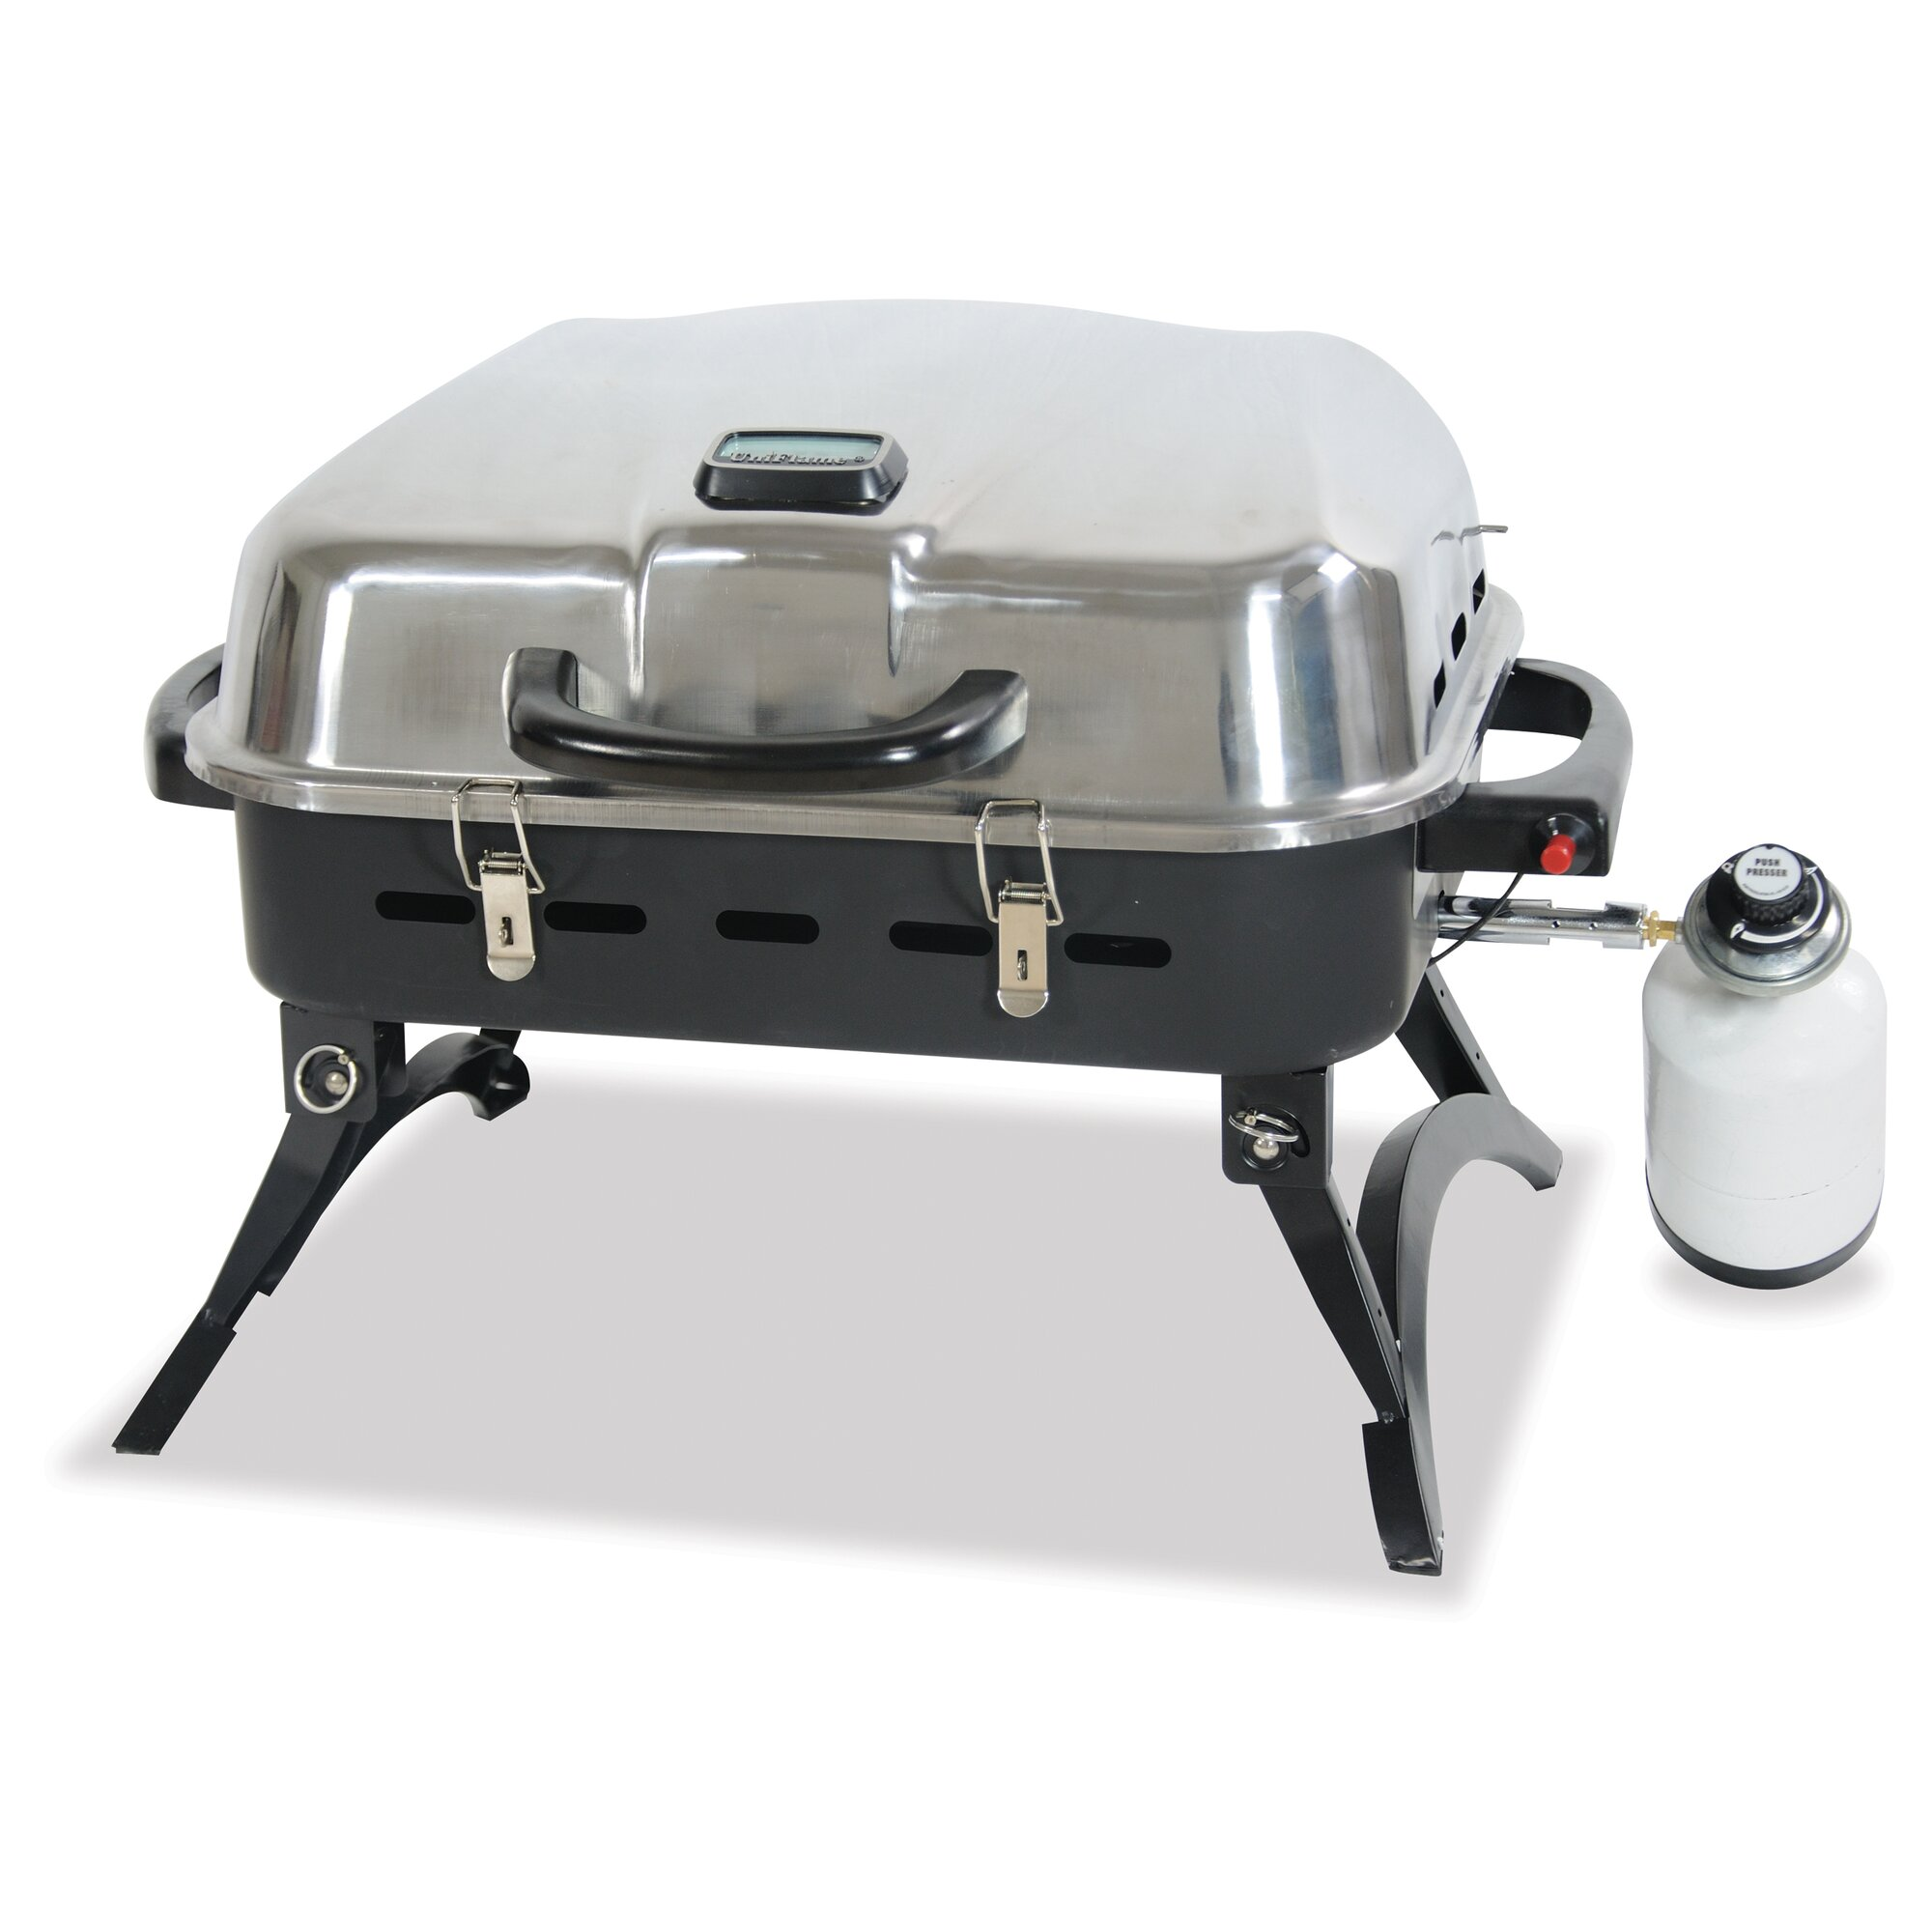 Uniflame 1-Burner Propane Gas BBQ Grill & Reviews | Wayfair